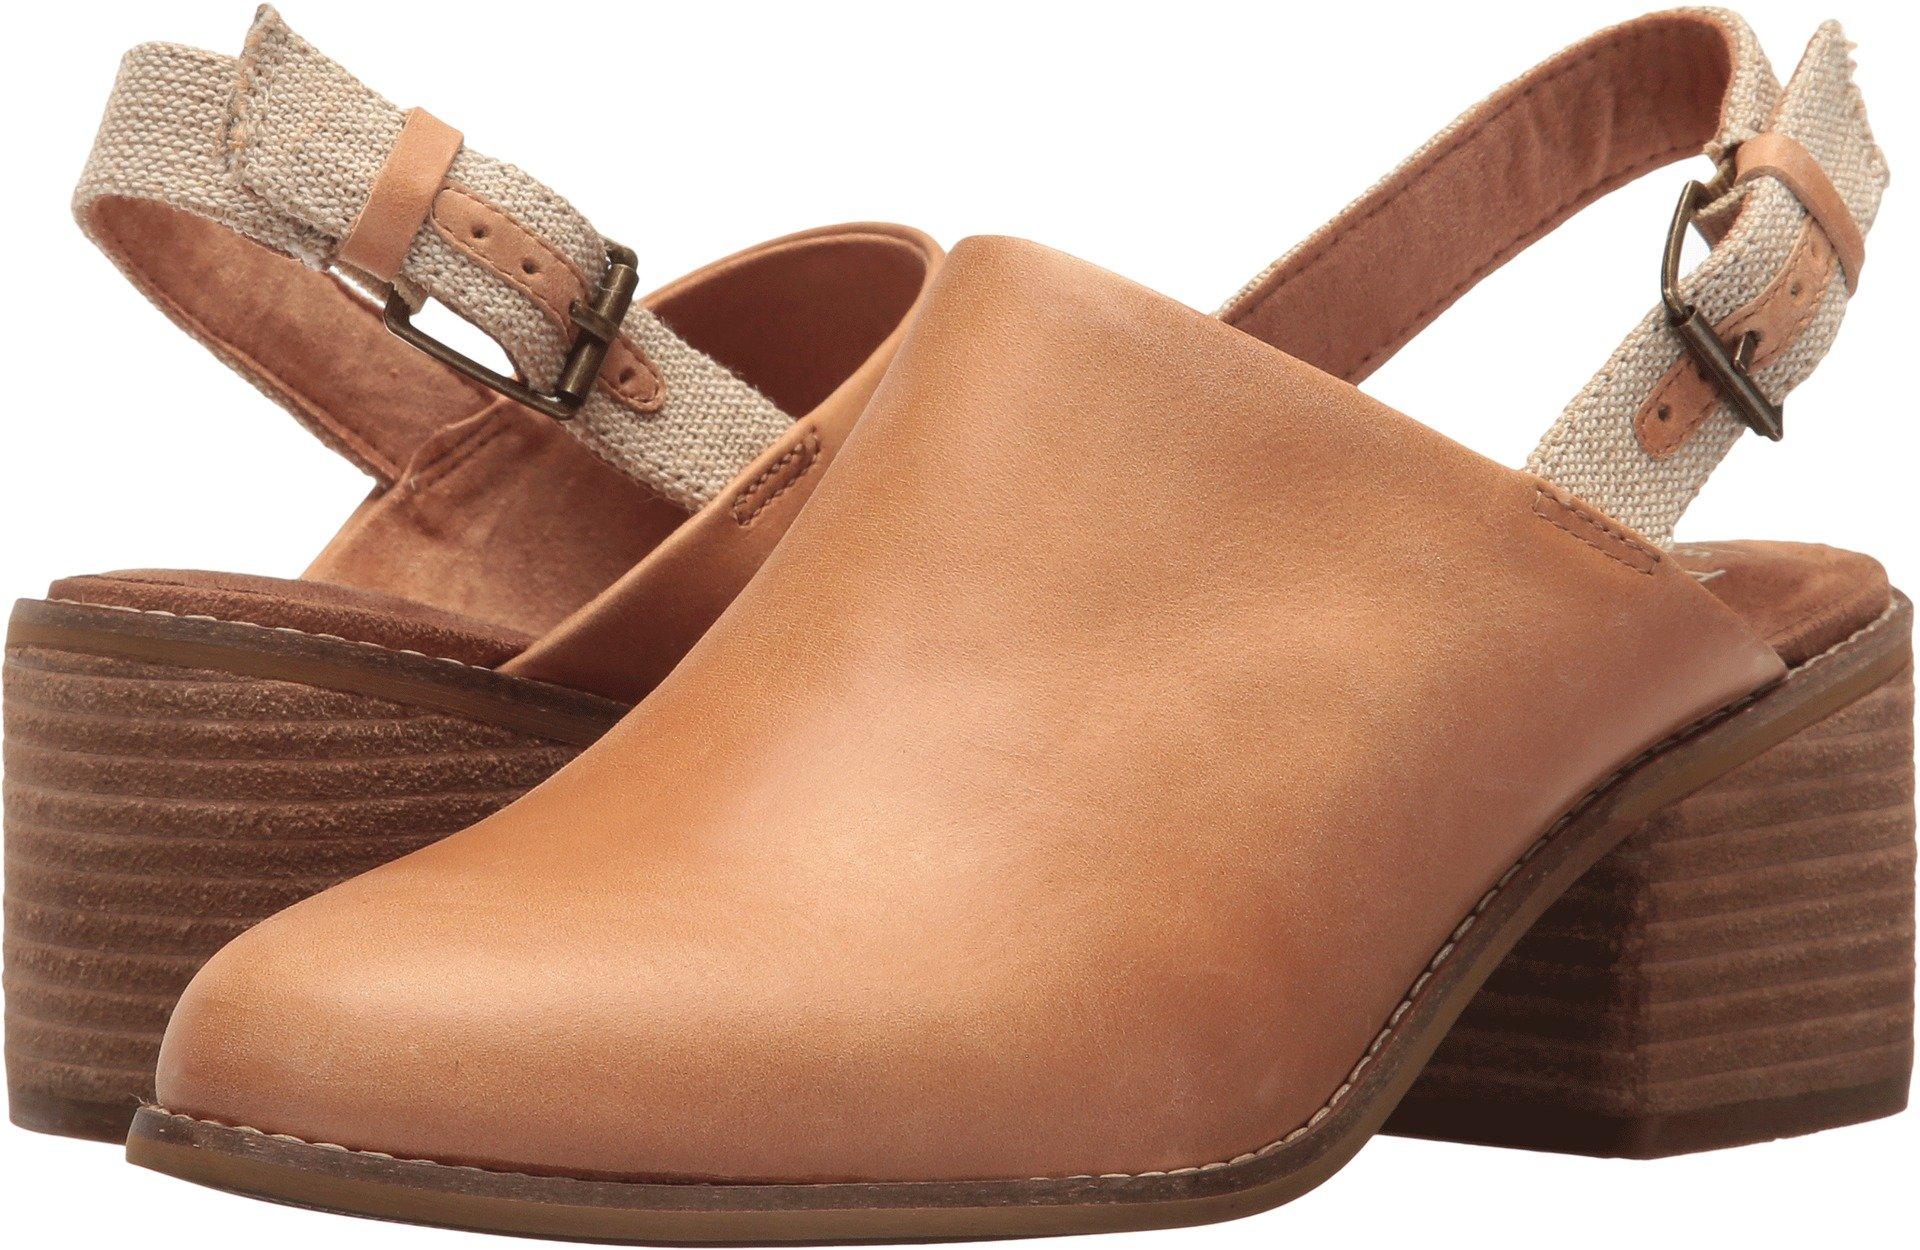 TOMS Women's Leila Slingback Honey Leather 7.5 B US